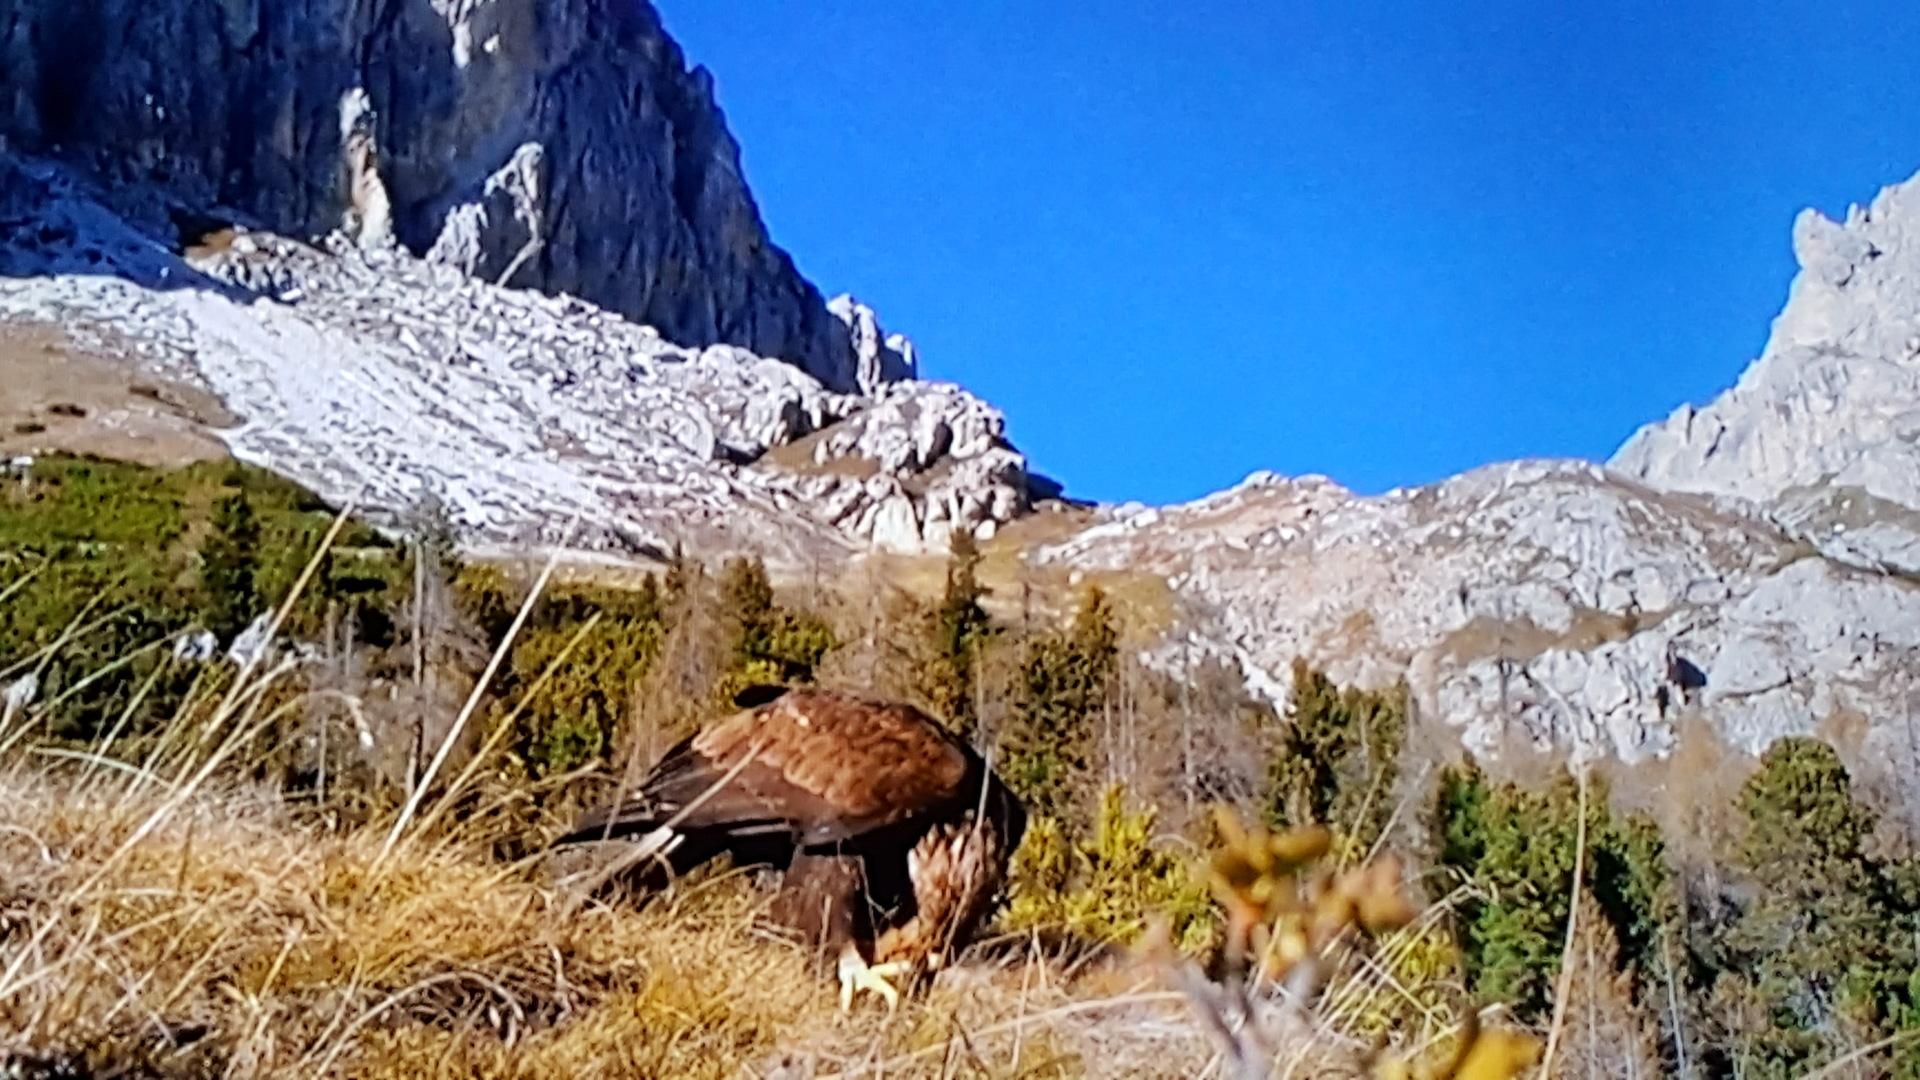 Wild nature | grass, mountain, outdoors, sky